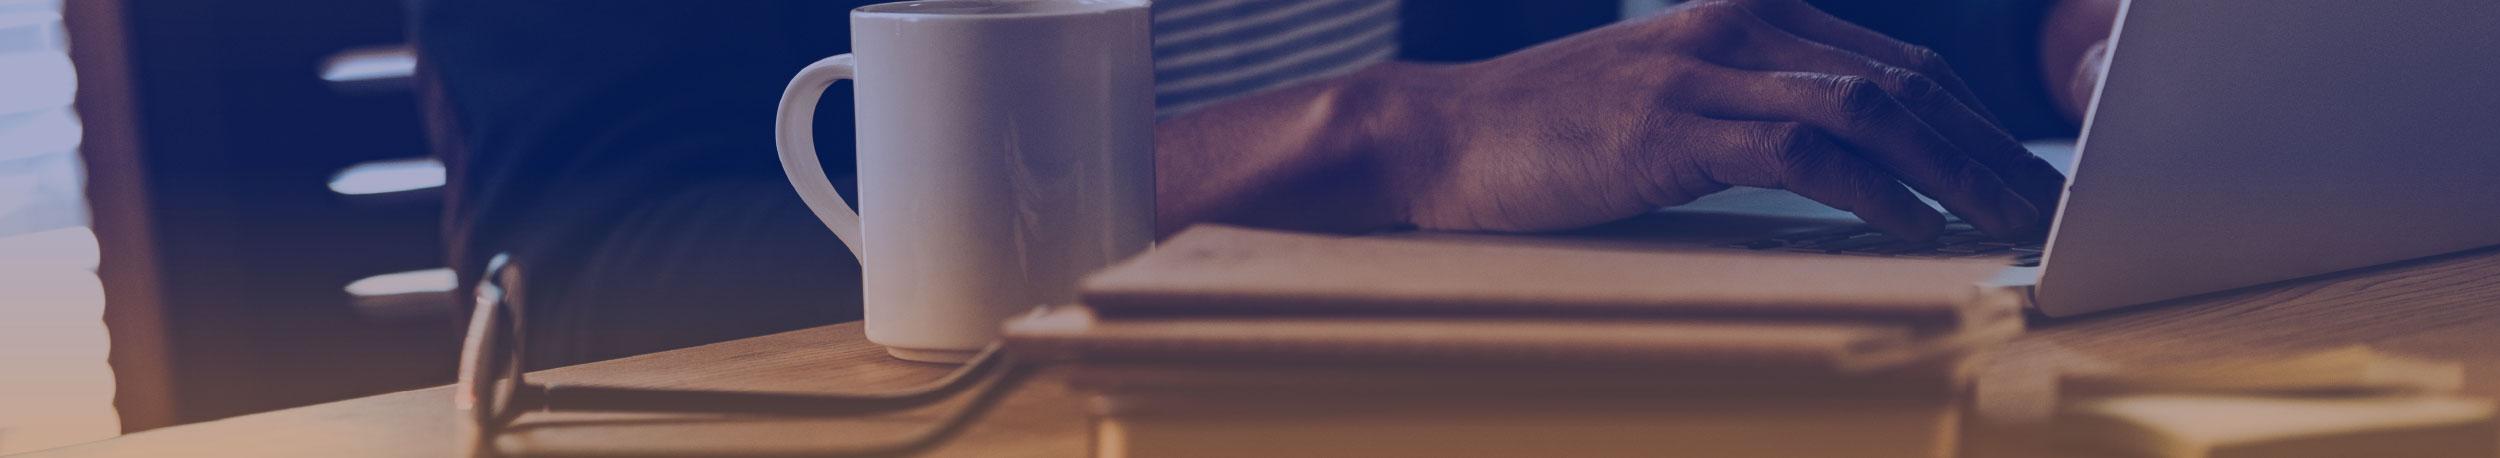 Netadmin will help Eurofiber to fully automate their B2B services